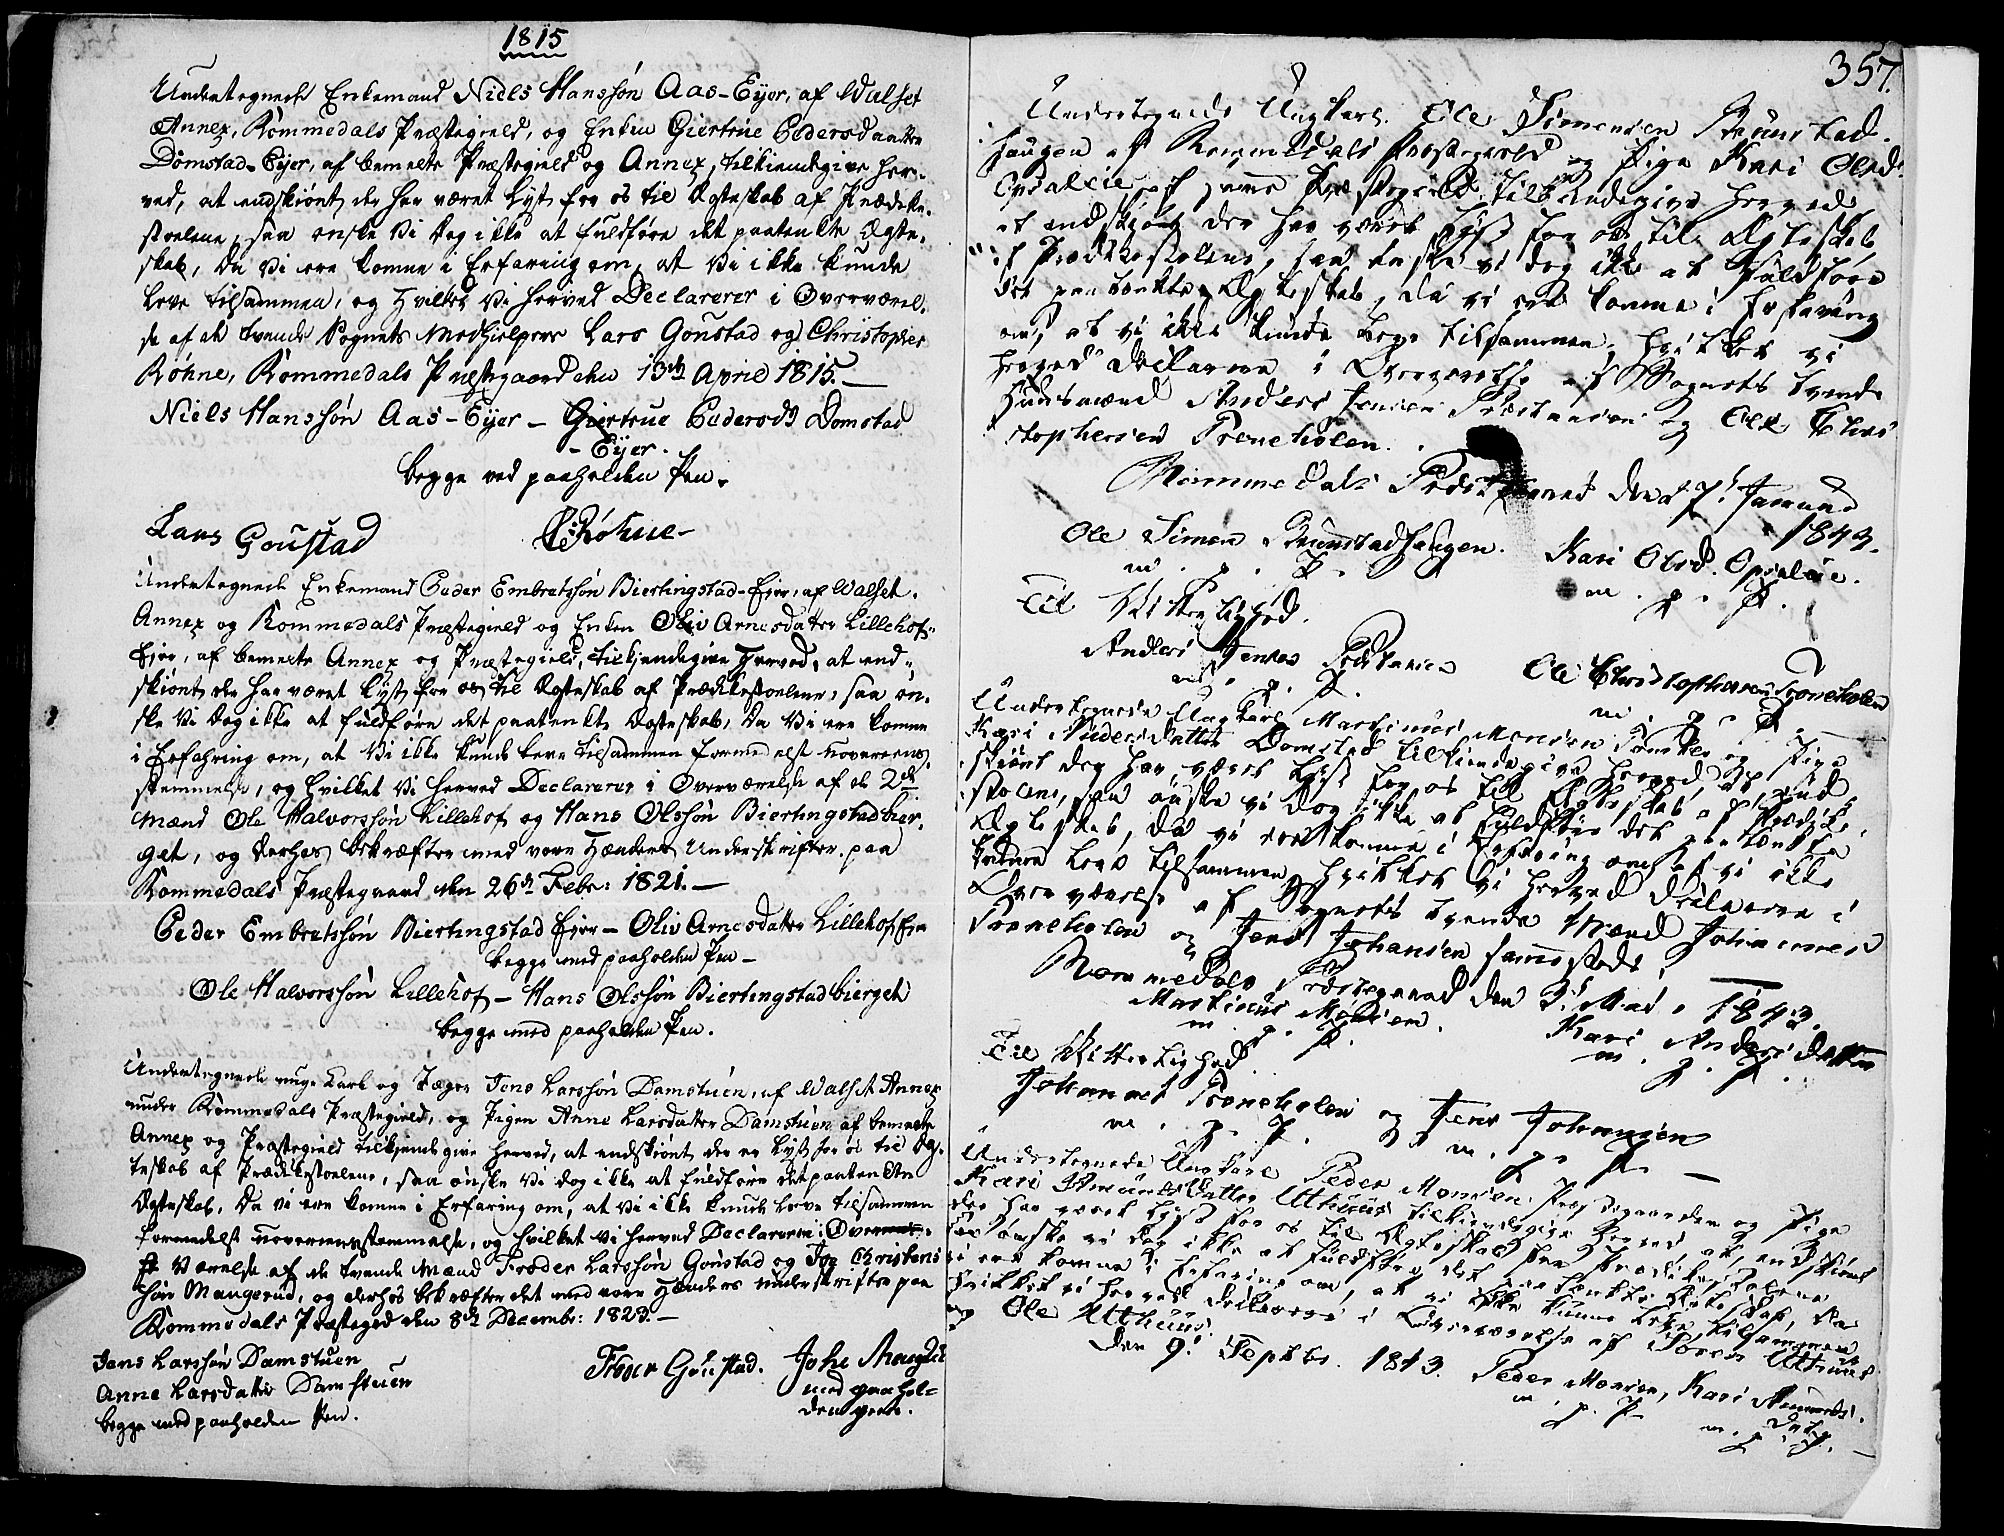 SAH, Romedal prestekontor, K/L0001: Ministerialbok nr. 1, 1799-1814, s. 357